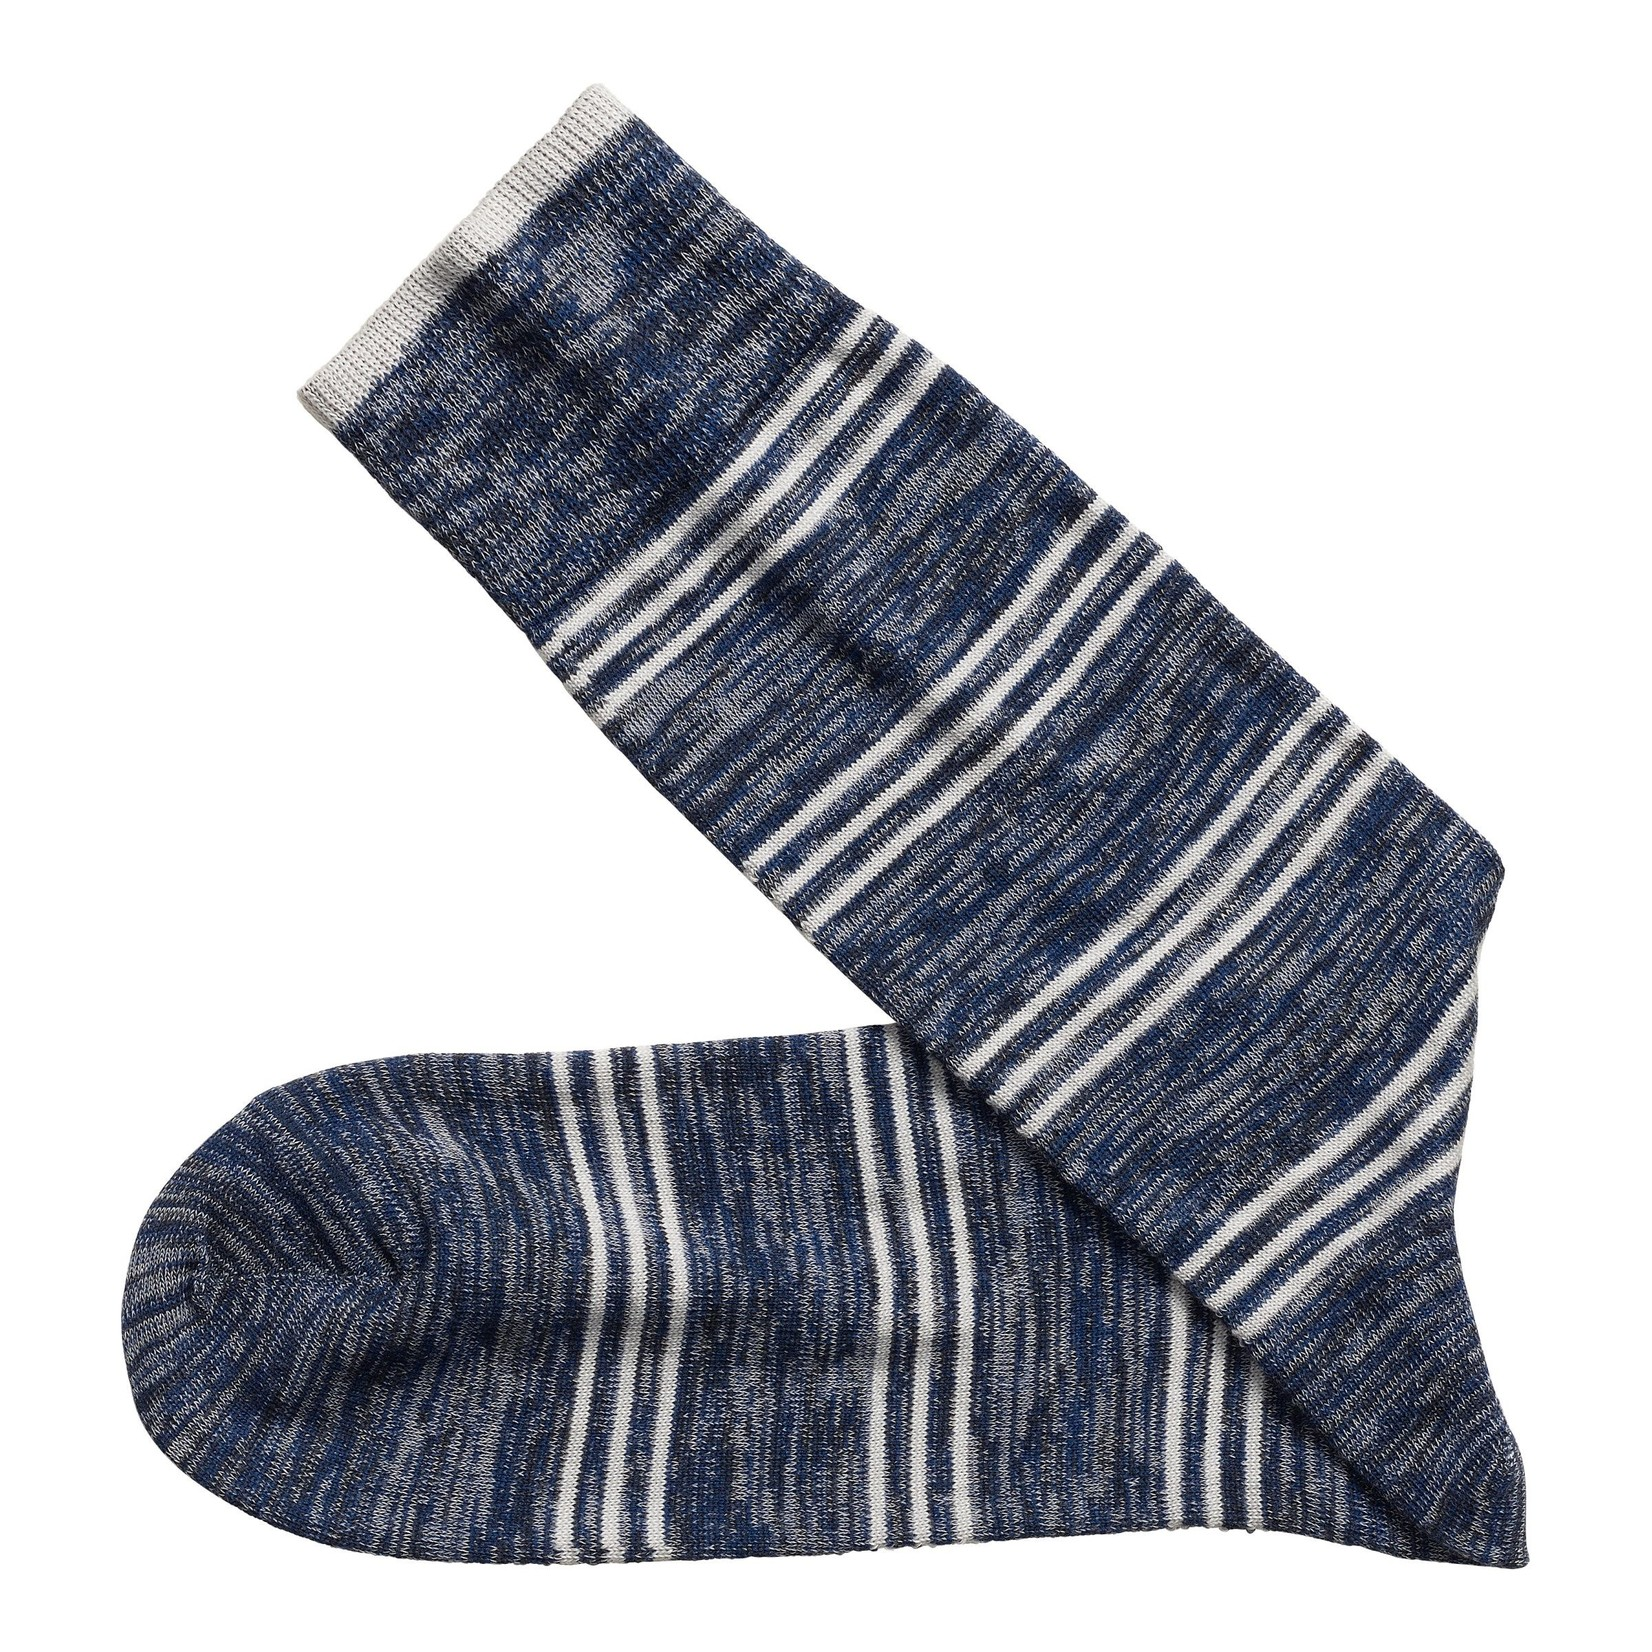 J&M Johnston & Murphy Heather Stripe Socks